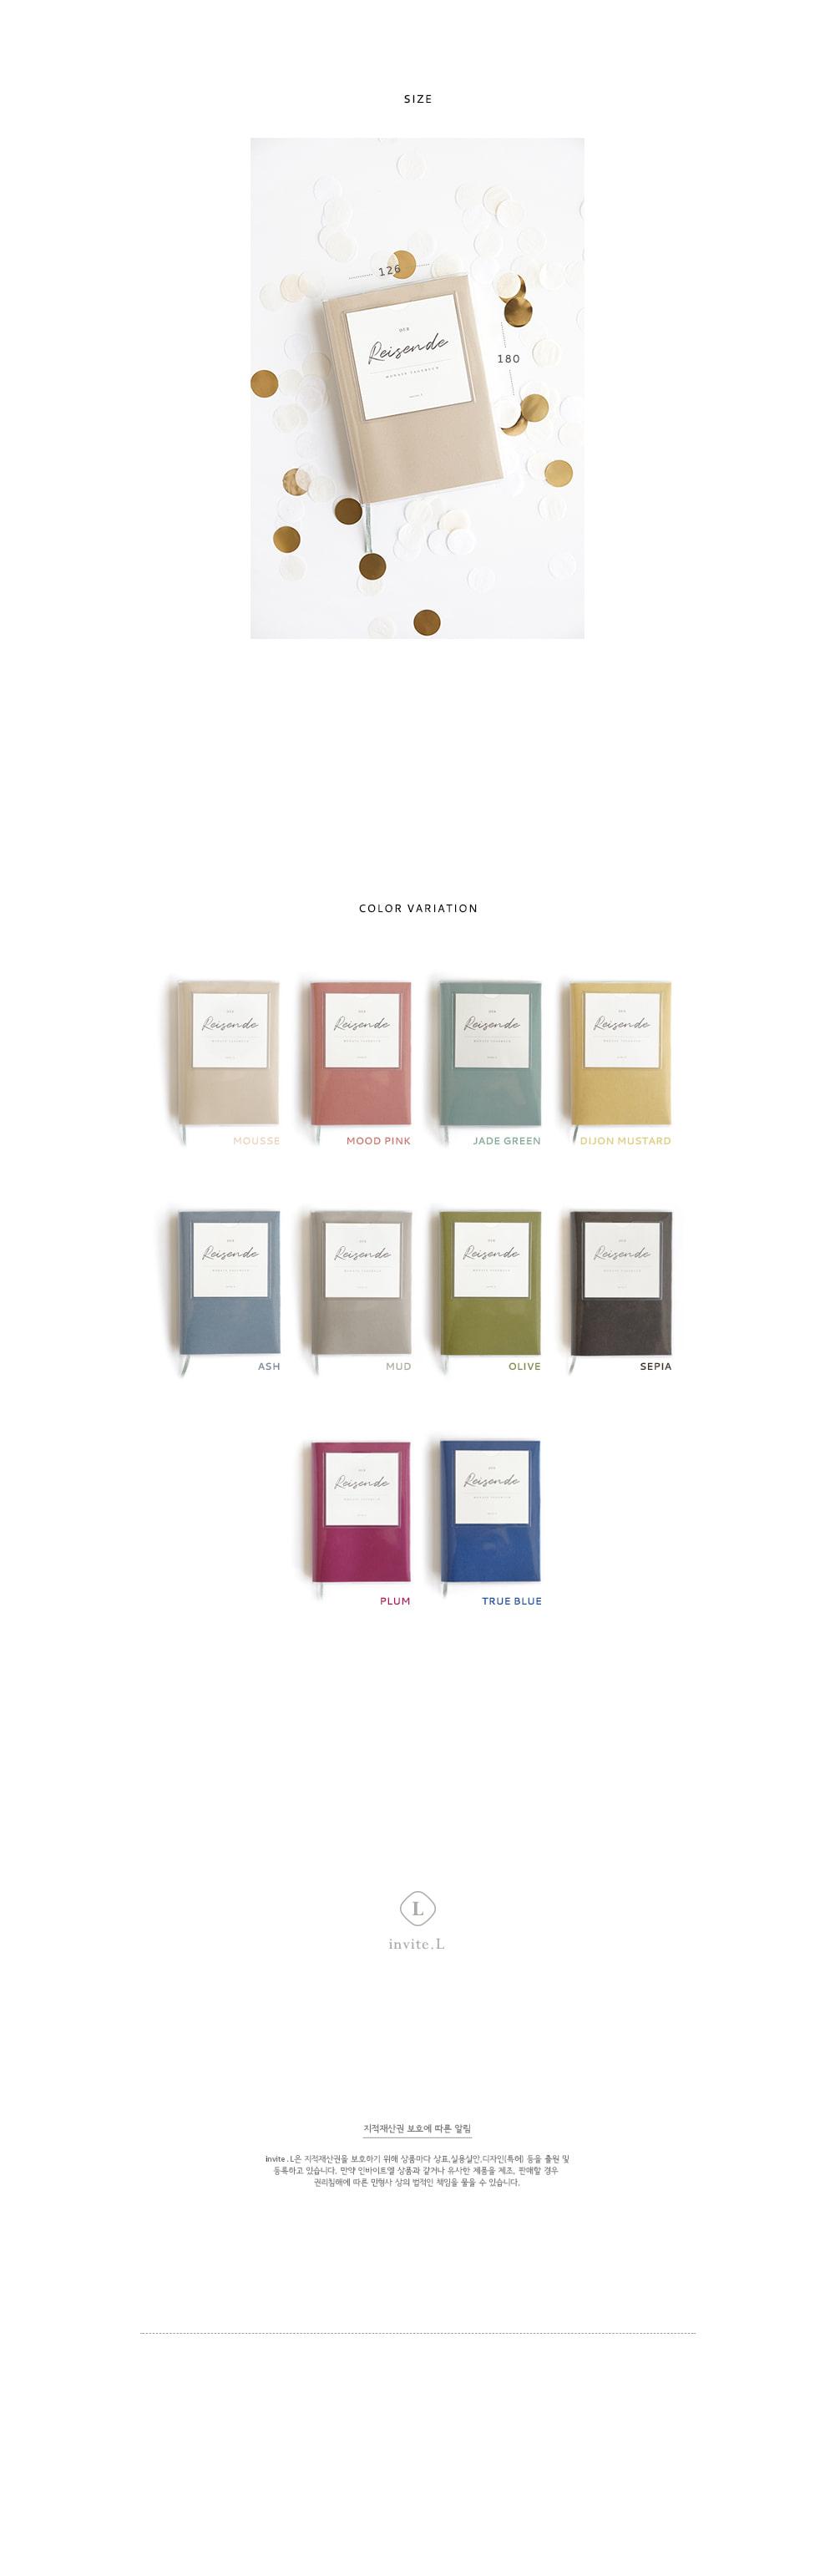 2020 diaries diary [2020 diary, 2020 diaries, diaries 2020]